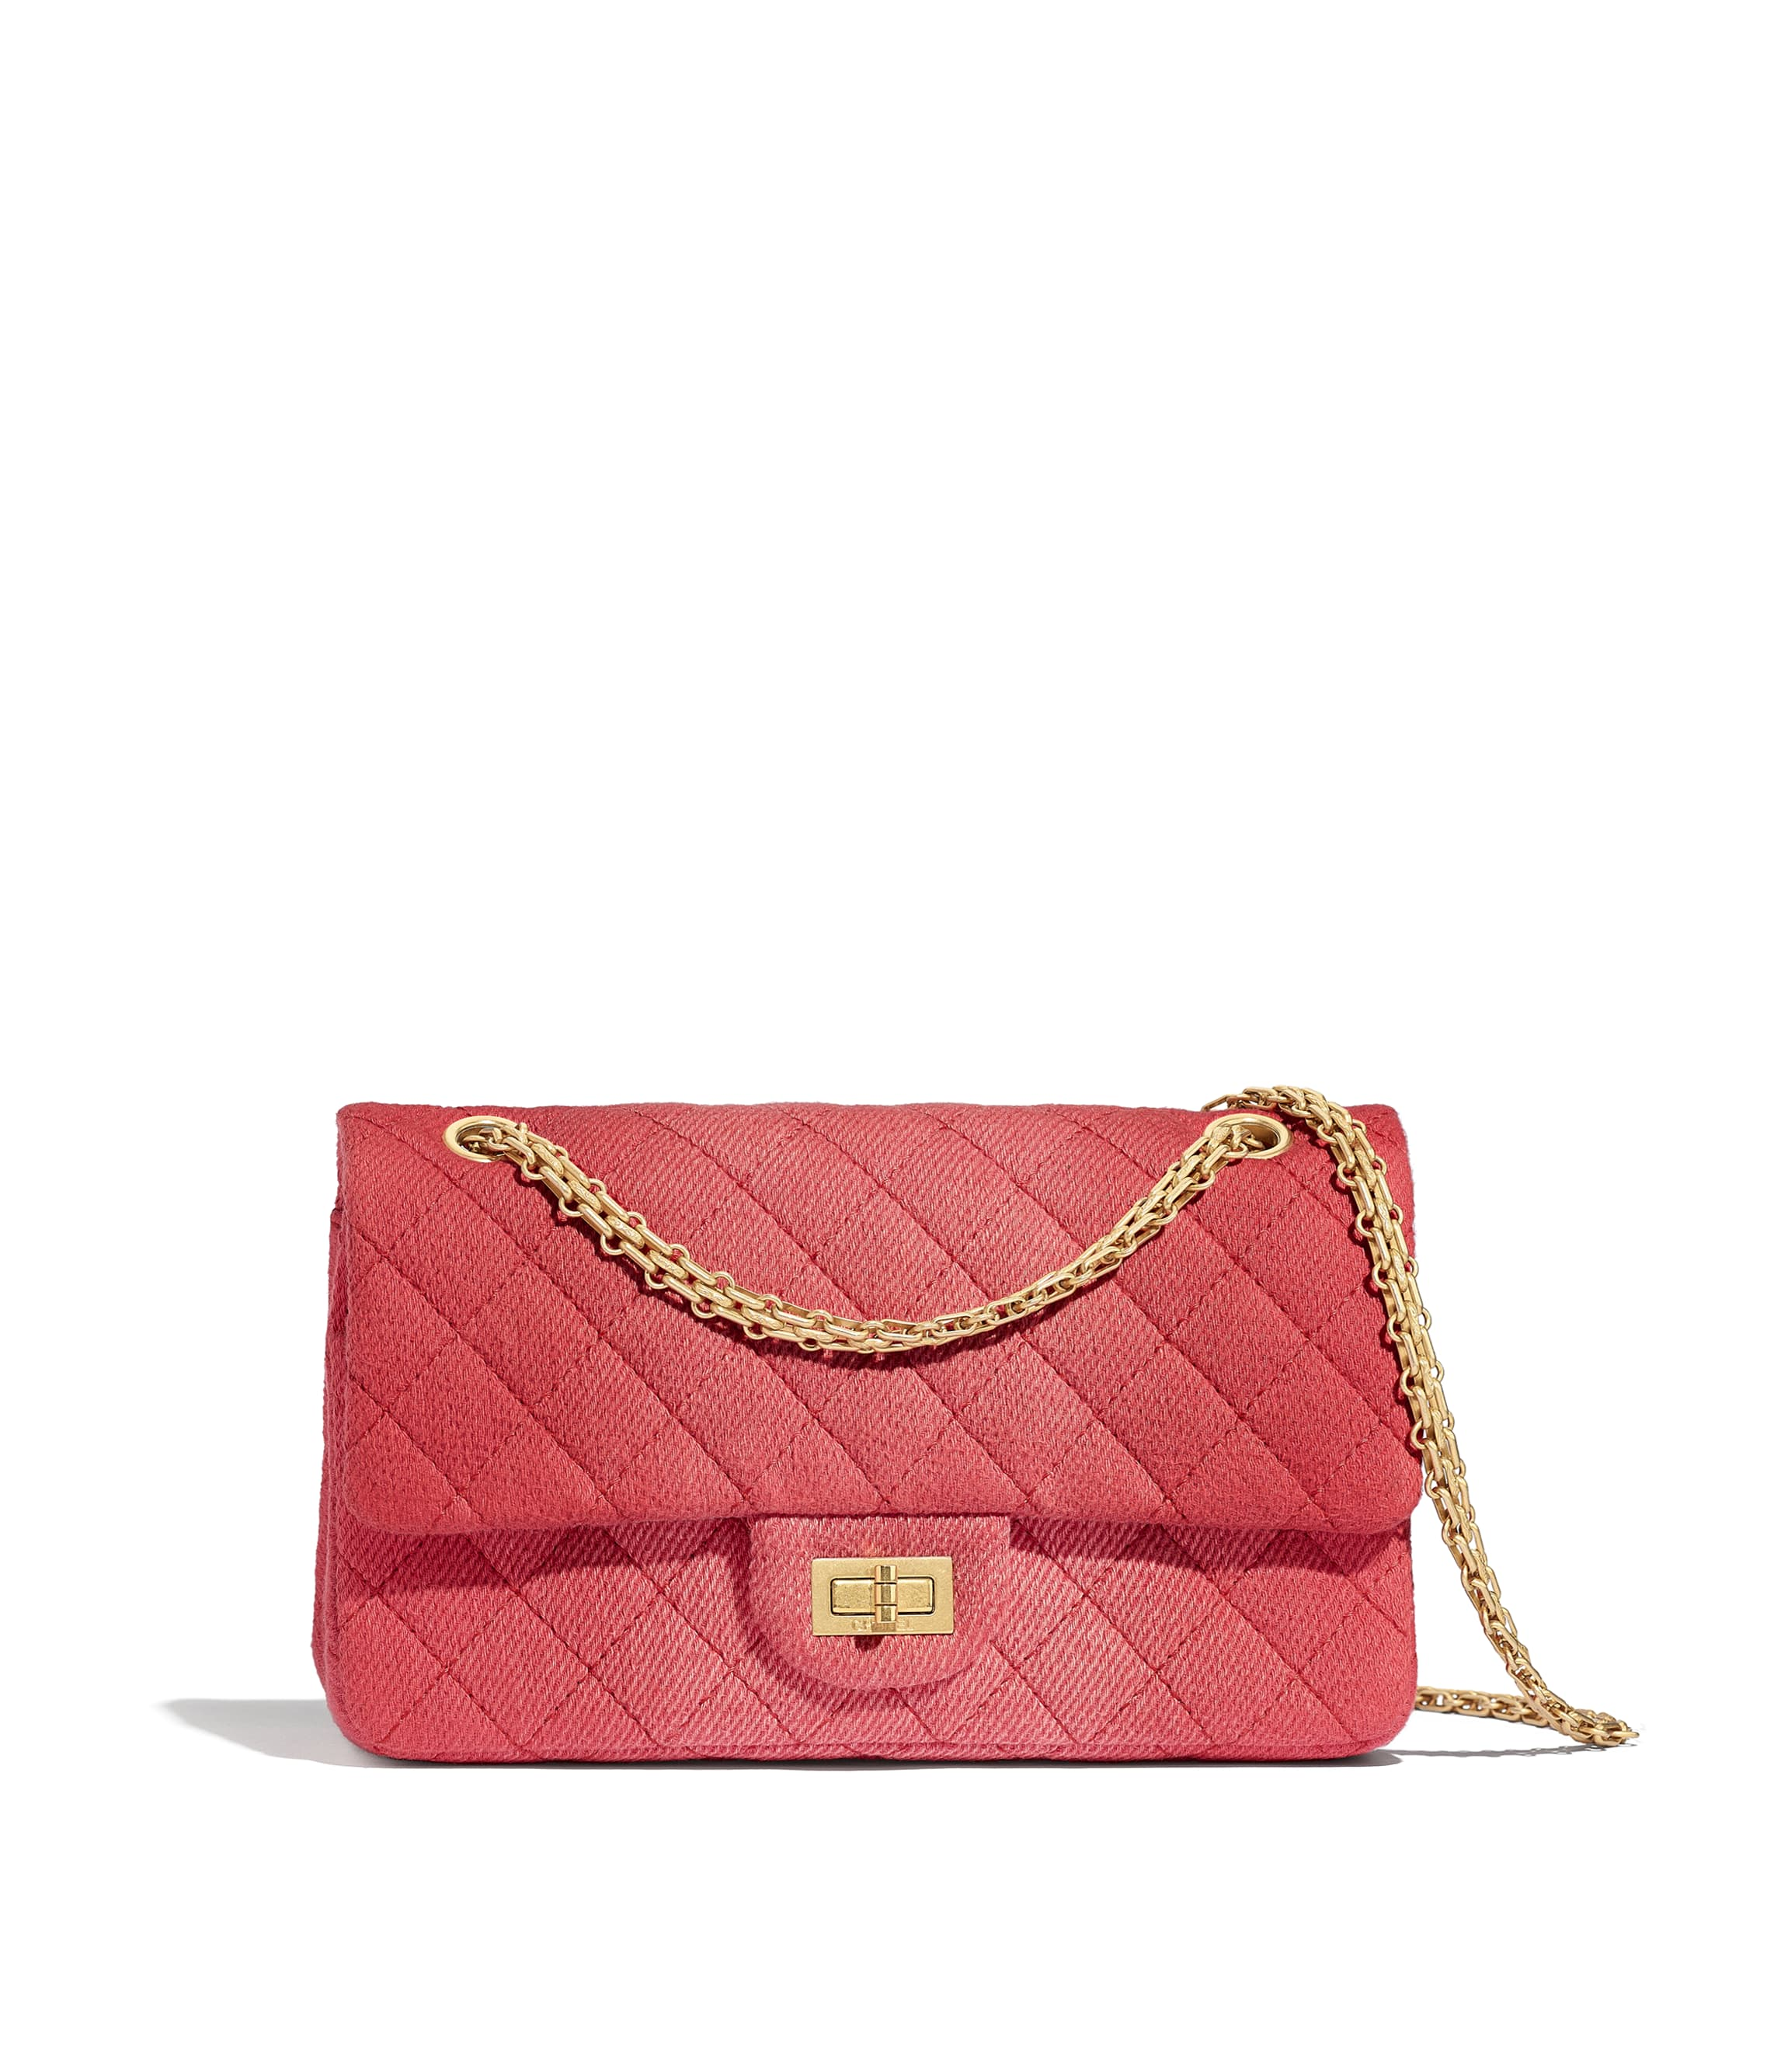 5449016fc459a0 2.55 Handbags - Handbags - CHANEL